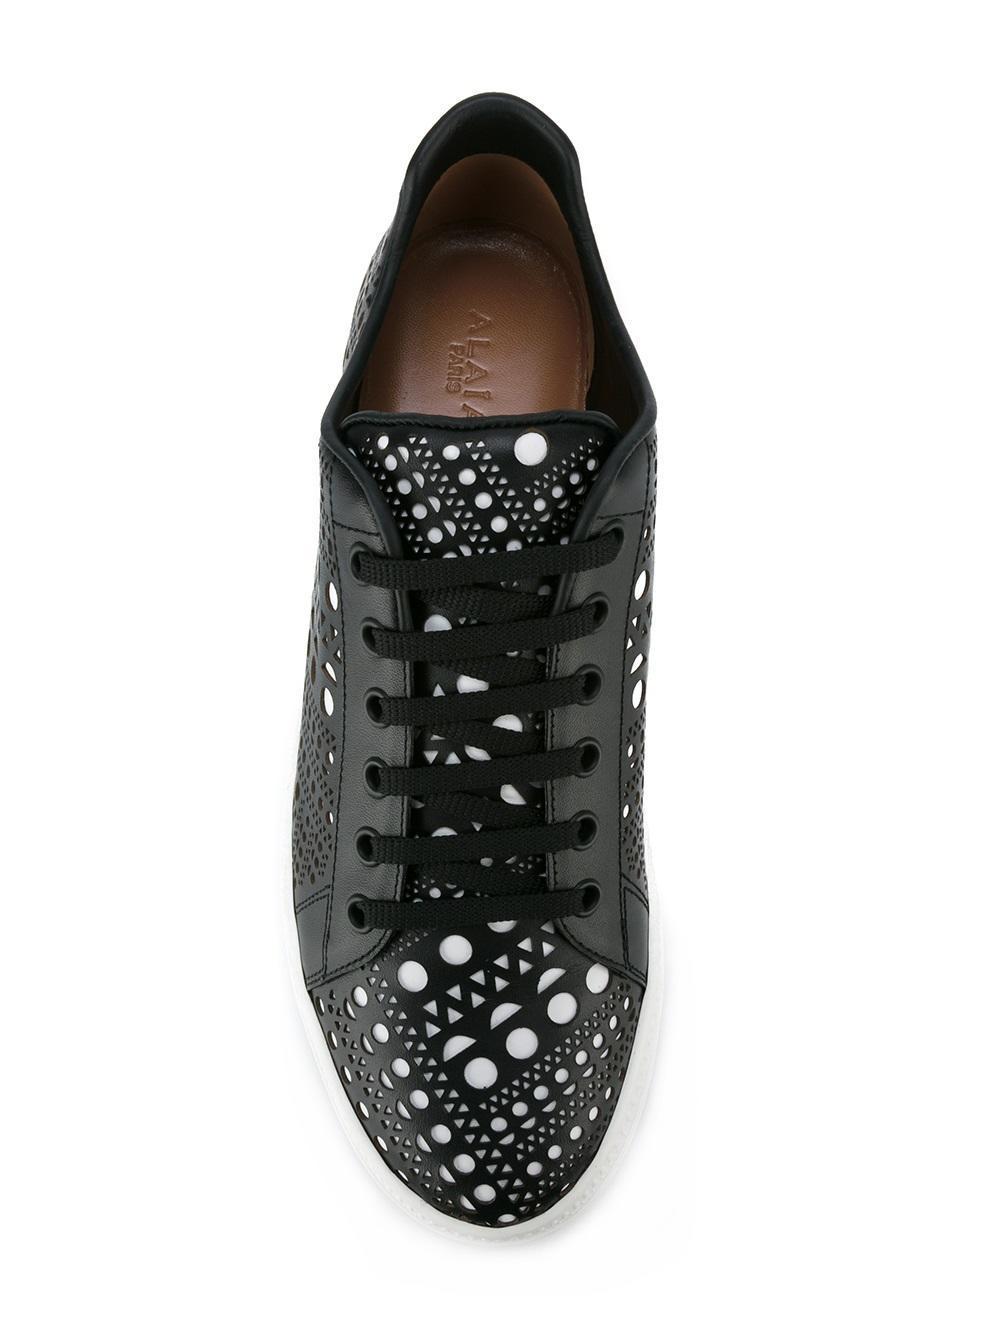 Alaïa Leather Laser Cut Sneakers in Black